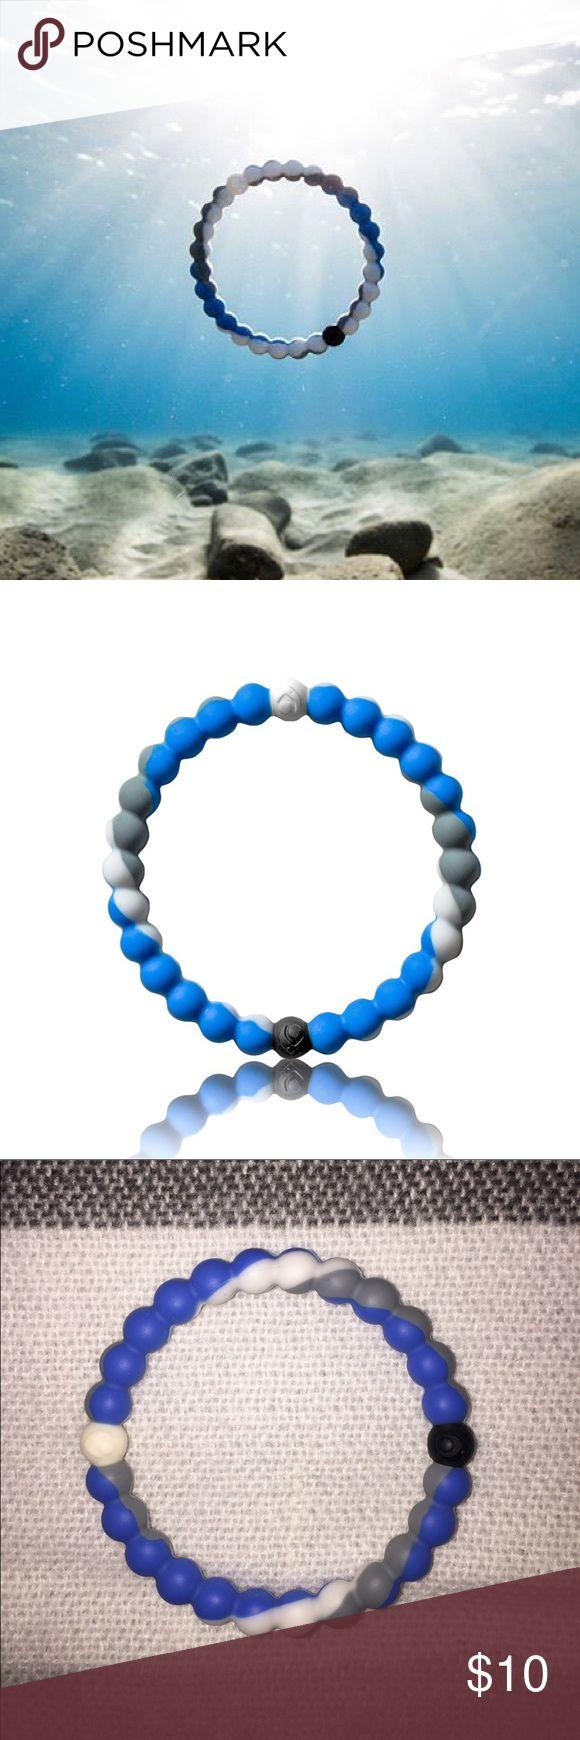 LOKAI shark week bracelet Lokai shark week !!!! 🦈🦈🦈 Lokai Jewelry Bracelets